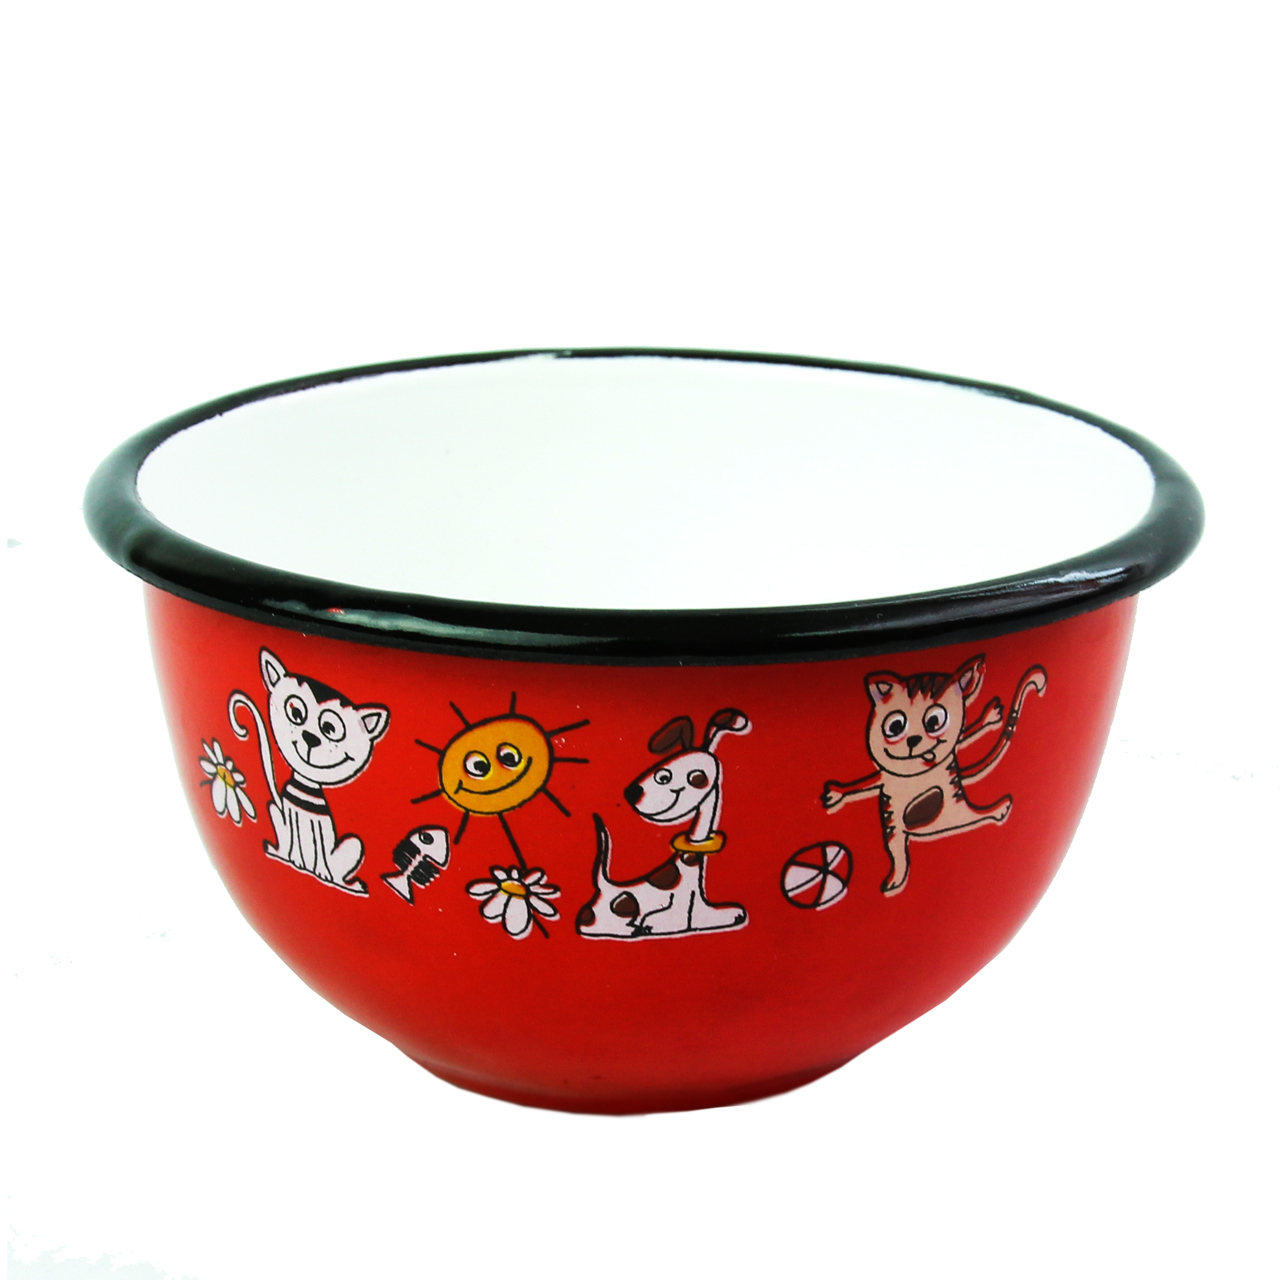 Bol Din Metal Rosu Cu Animalute 13 Cm